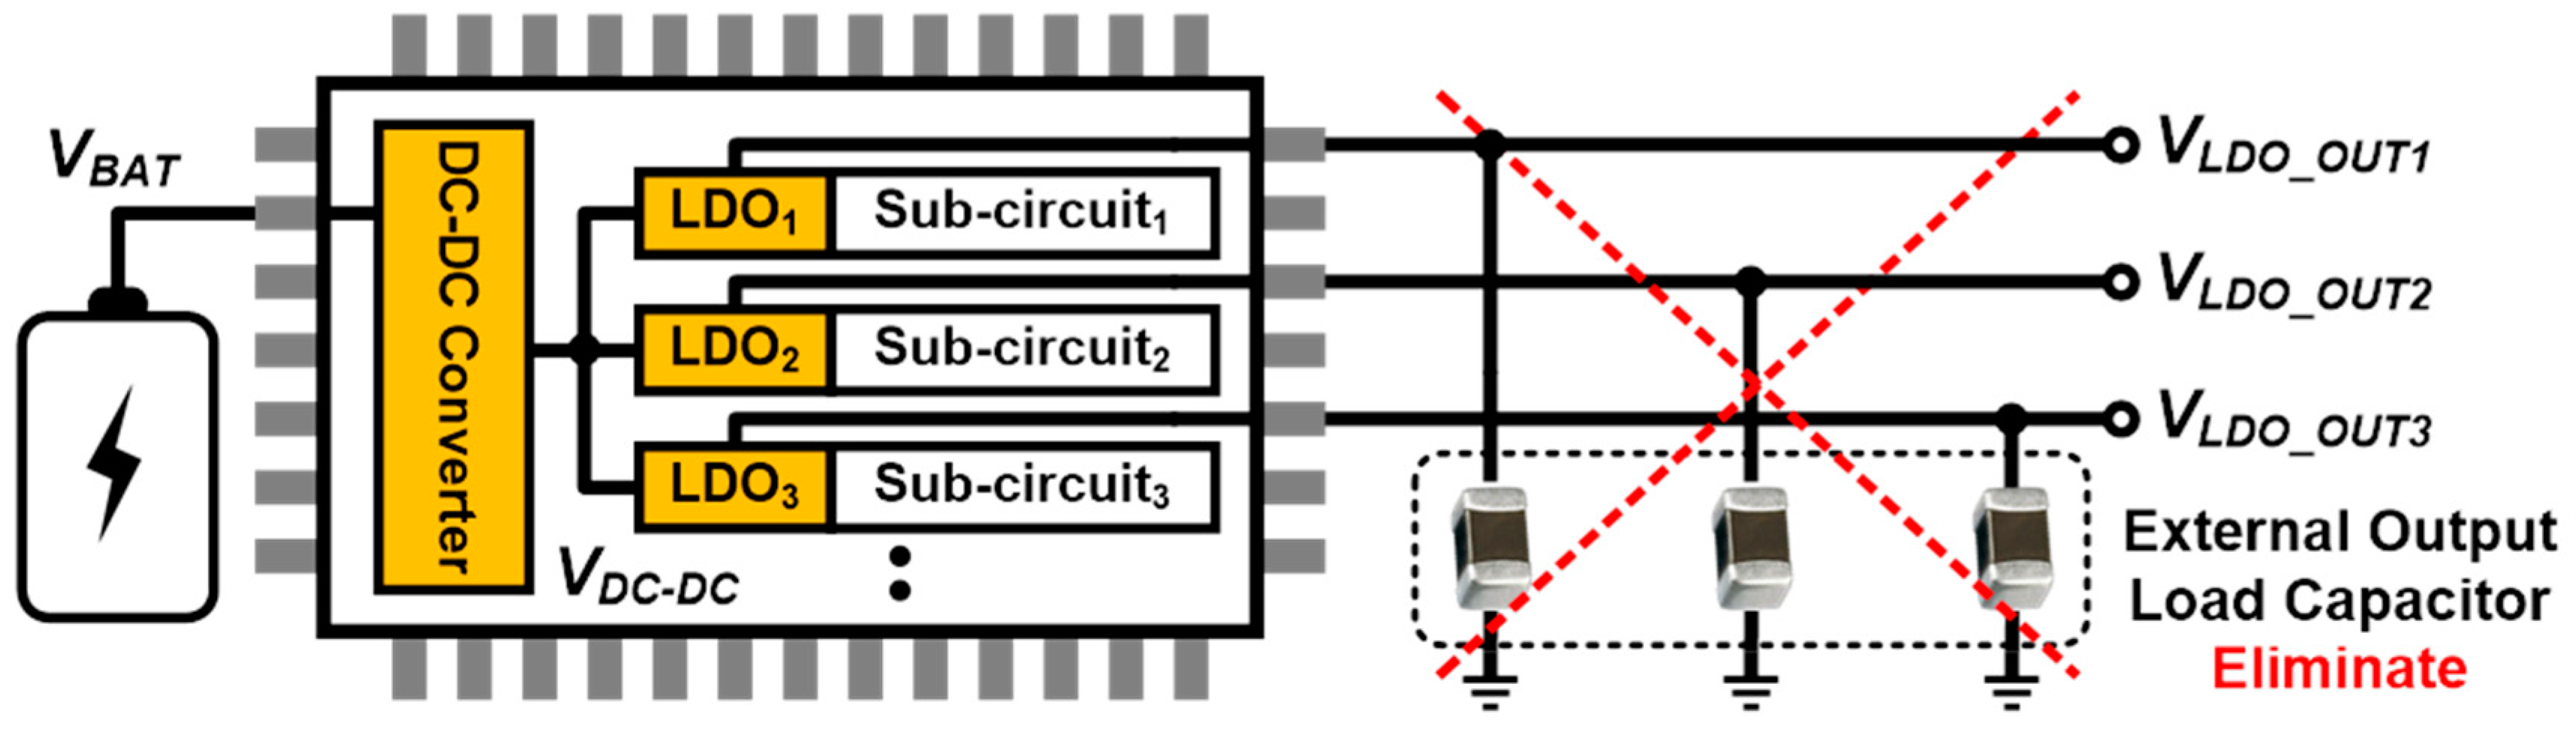 Fasco Motor Wiring Diagram Fasco use case diagram for college ...